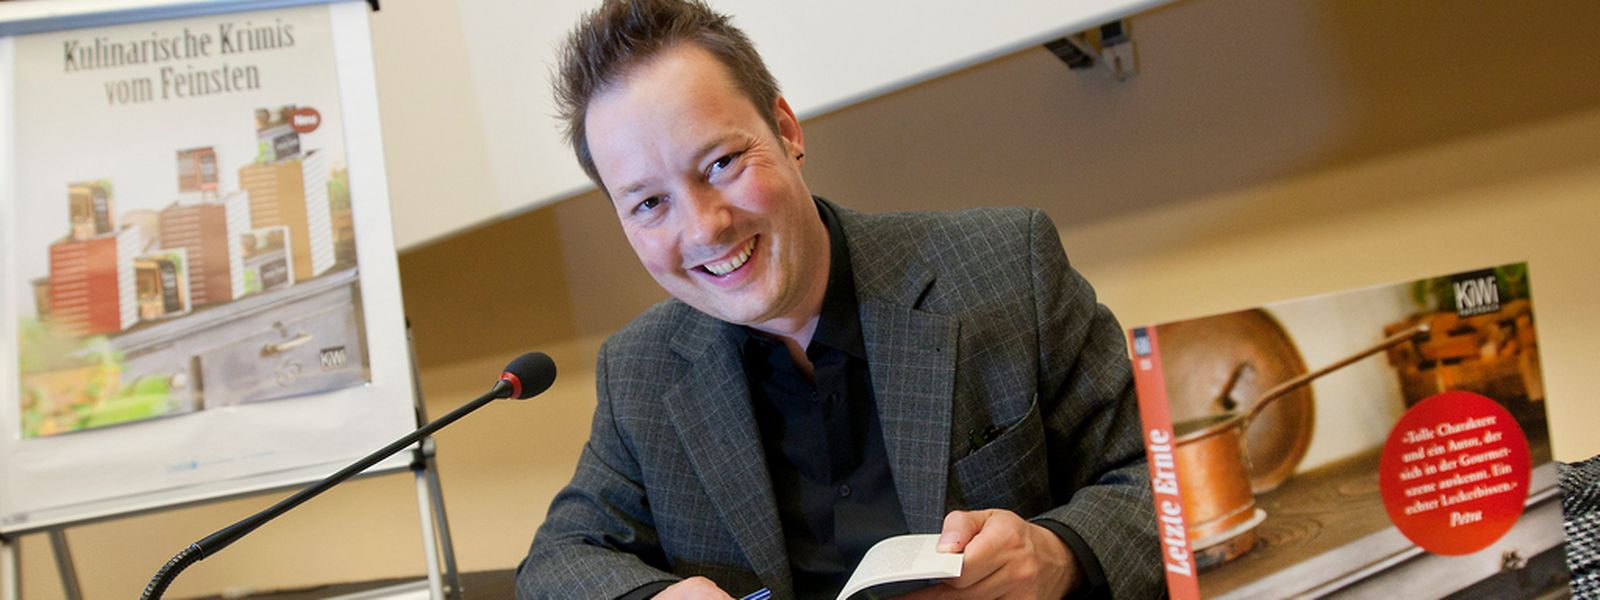 Autor Tom Hillenbrand liest wieder im Cercle Cité.